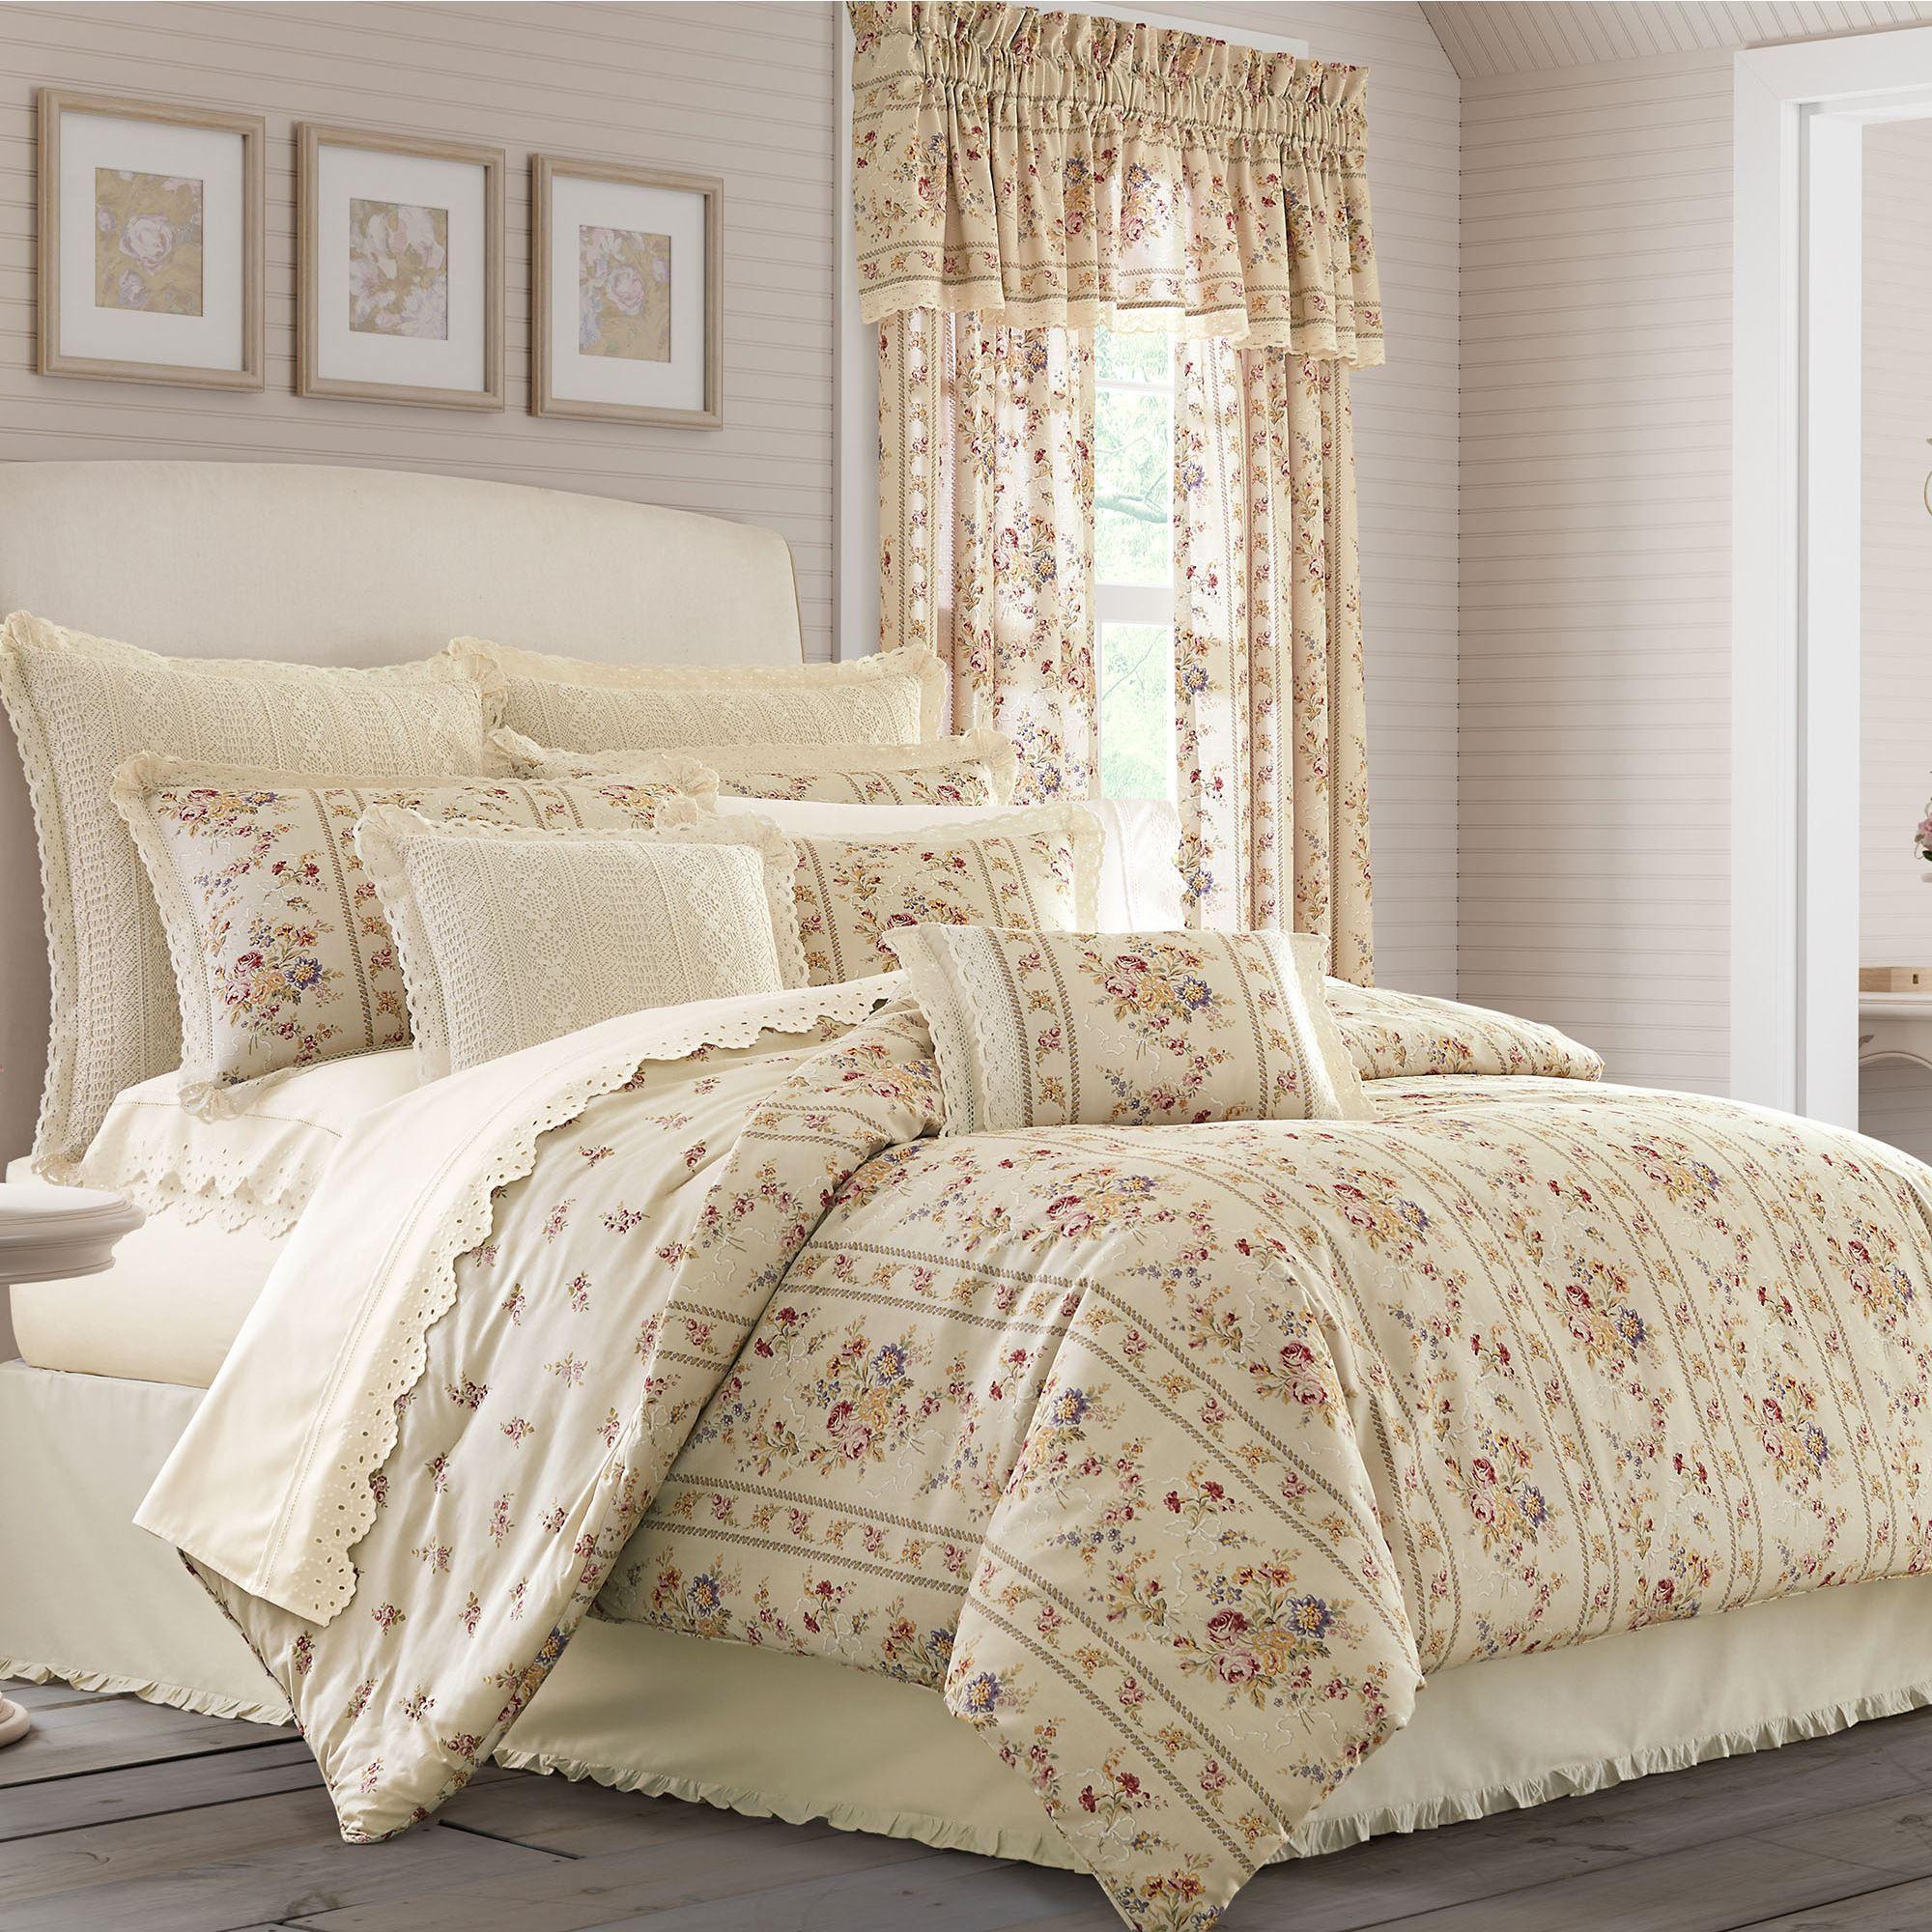 Sadie Reversible Vintage Floral Comforter Bedding By Piper